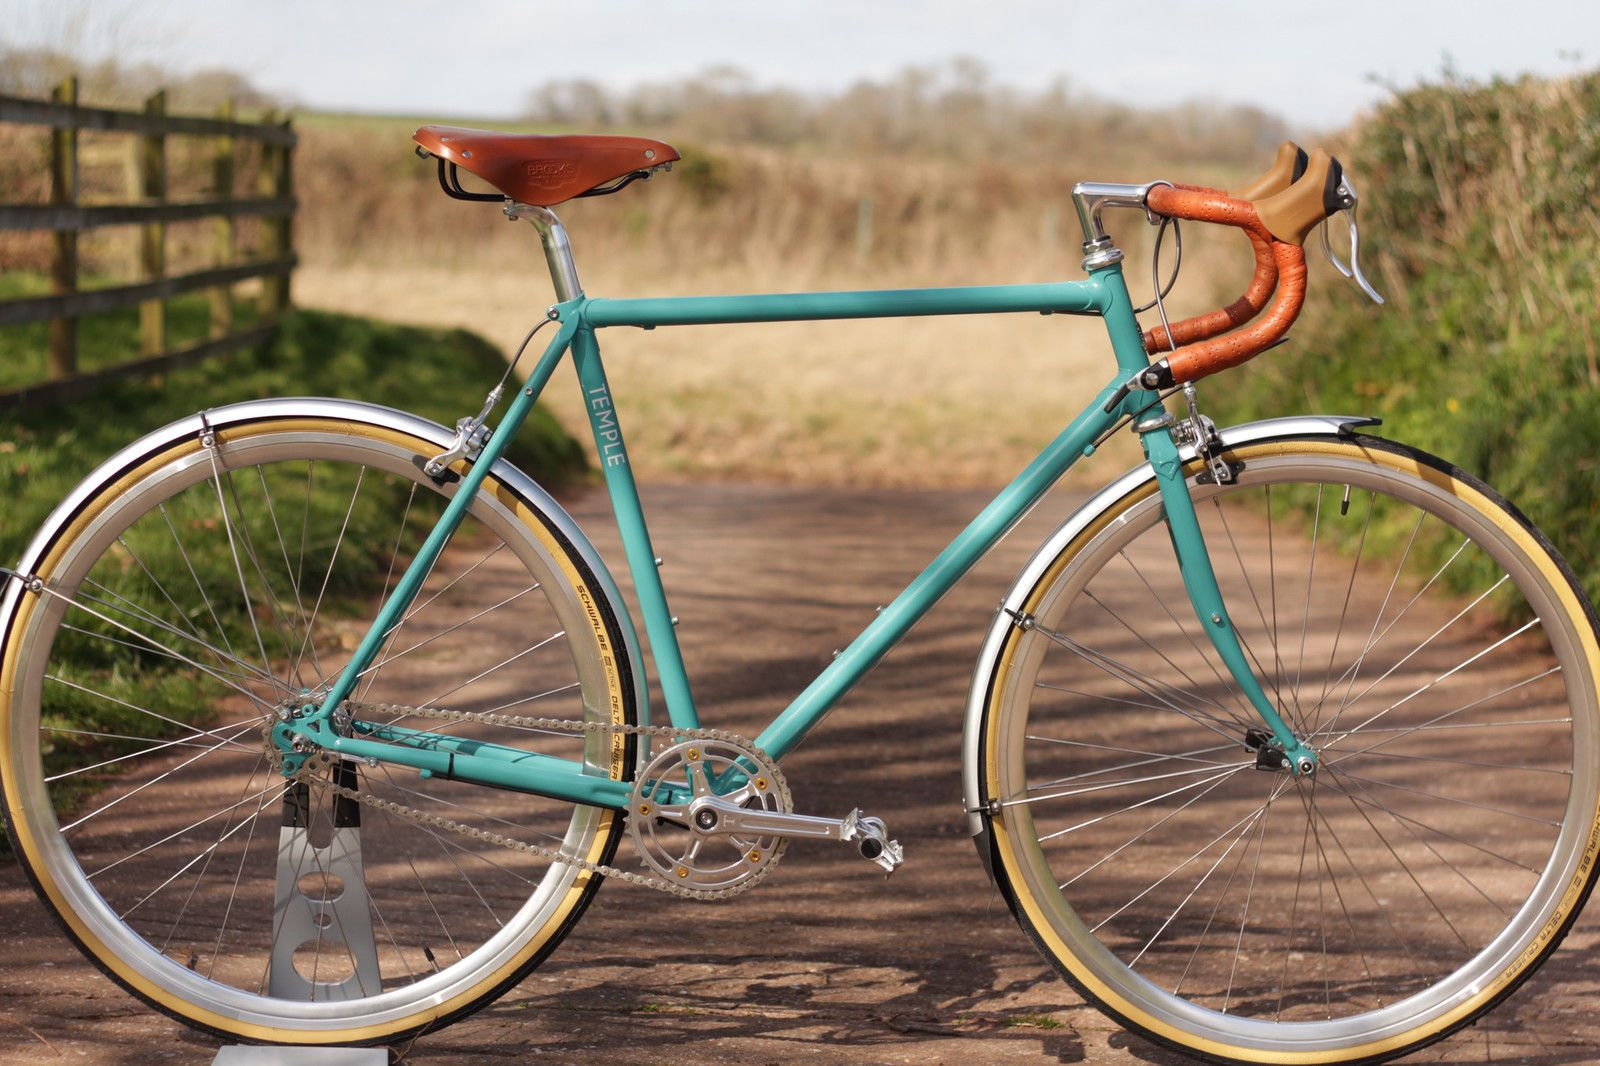 Temple Cycles Kingsdown Road Touring Bike Classic Vintage Style British Touring Bike Steel Bike Touring